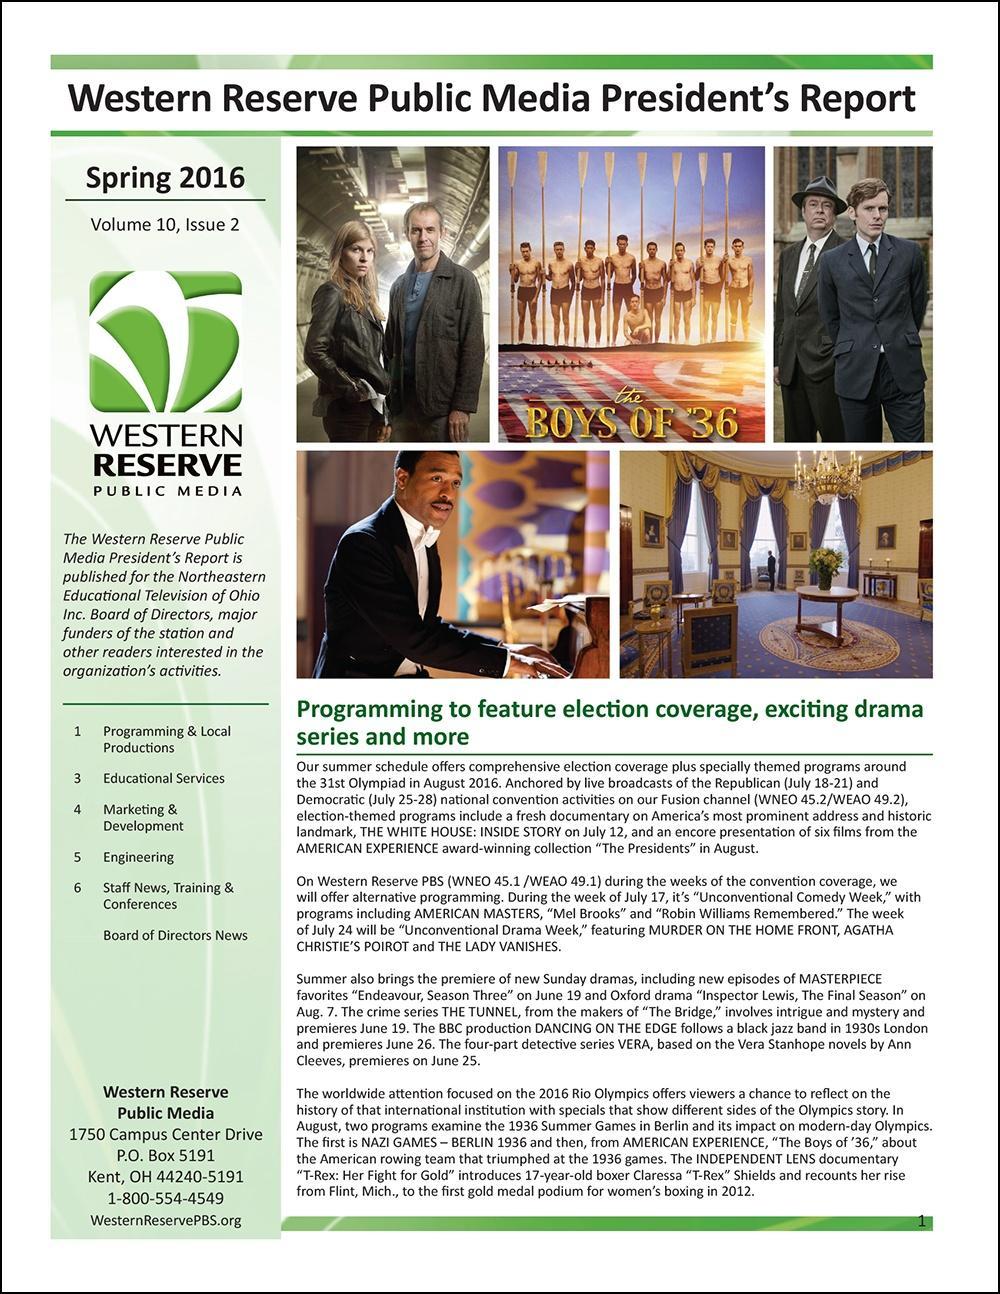 Spring 2016 - Volume 10, Issue 2